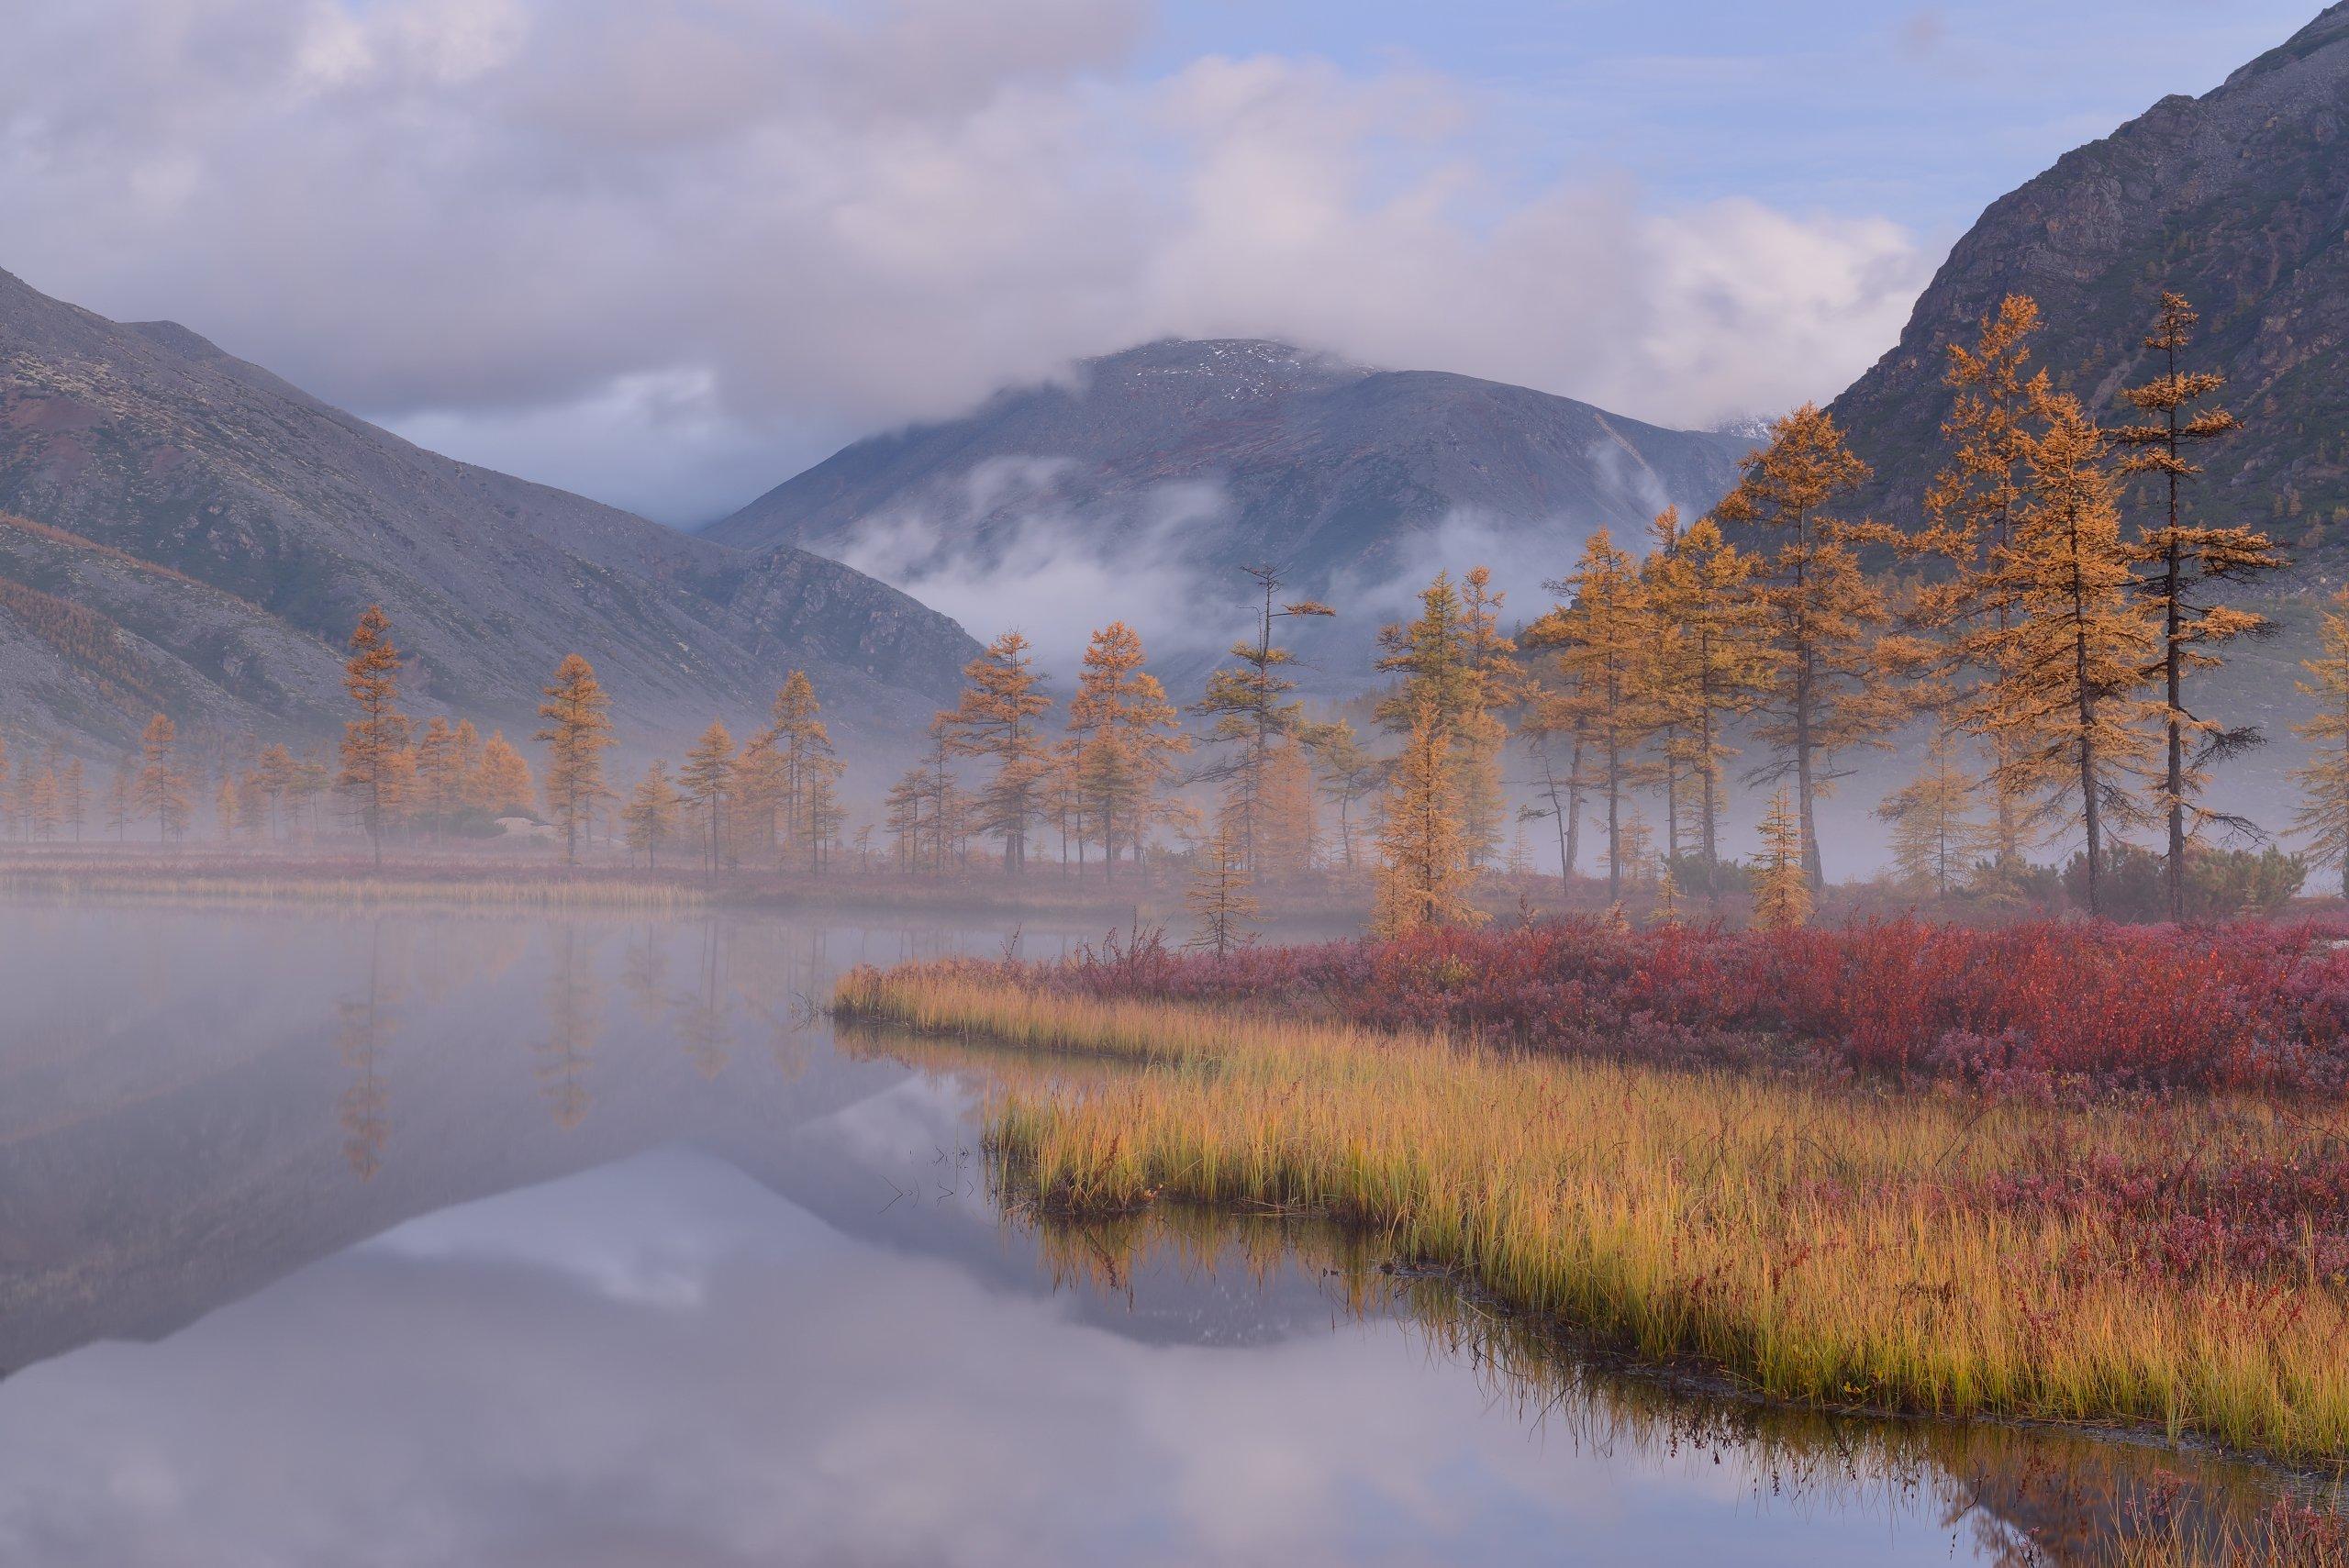 Озеро Джека Лондона, Колыма , Максим Евдокимов (phototourtravel.ru)